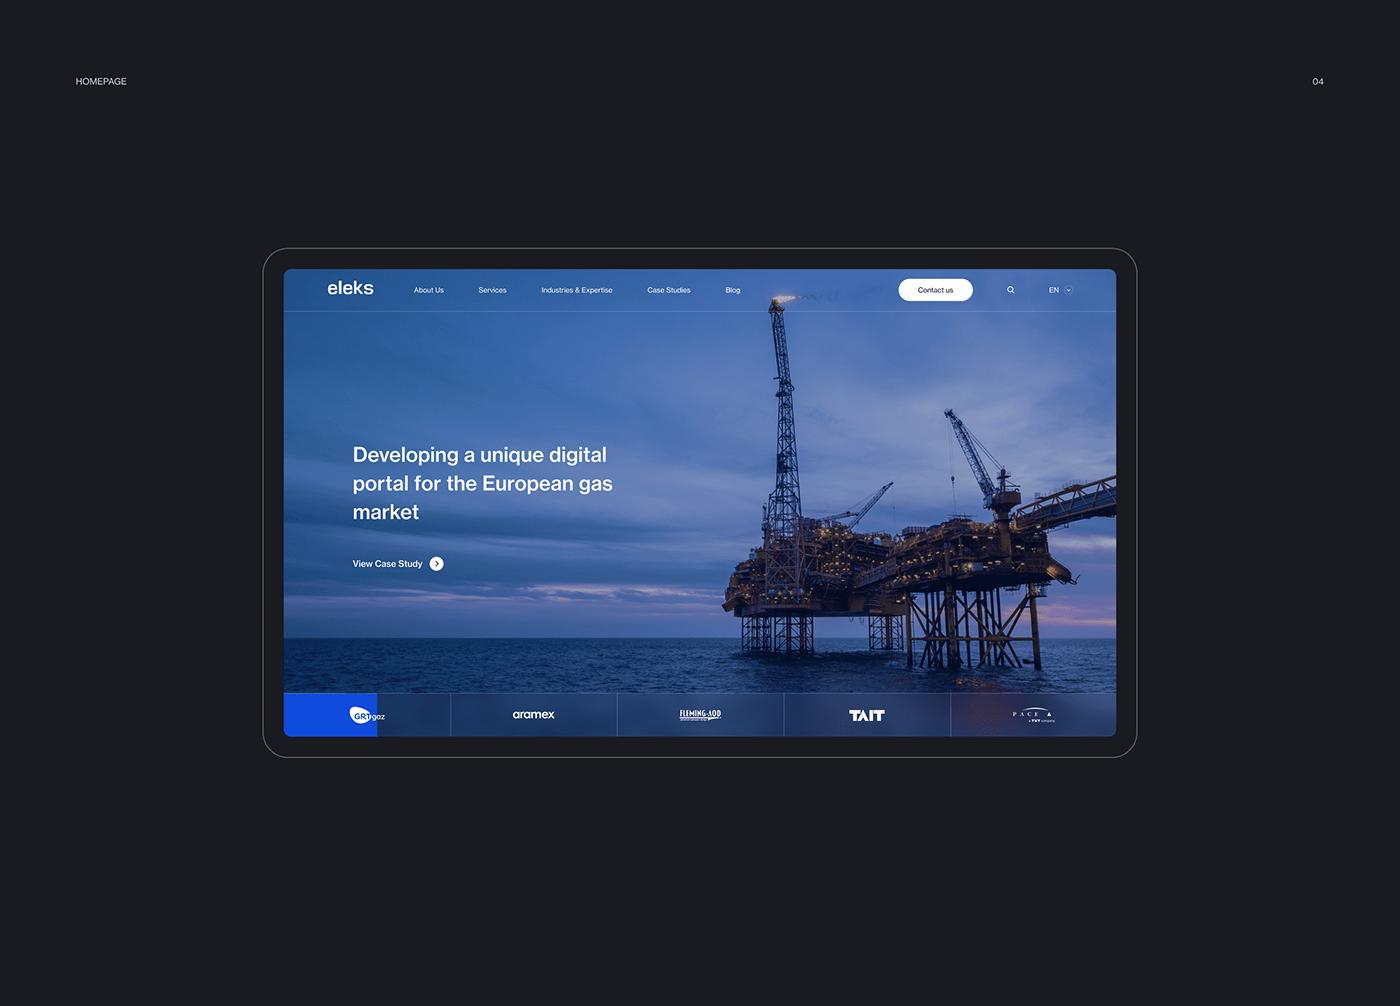 Image may contain: ship, electronics and monitor